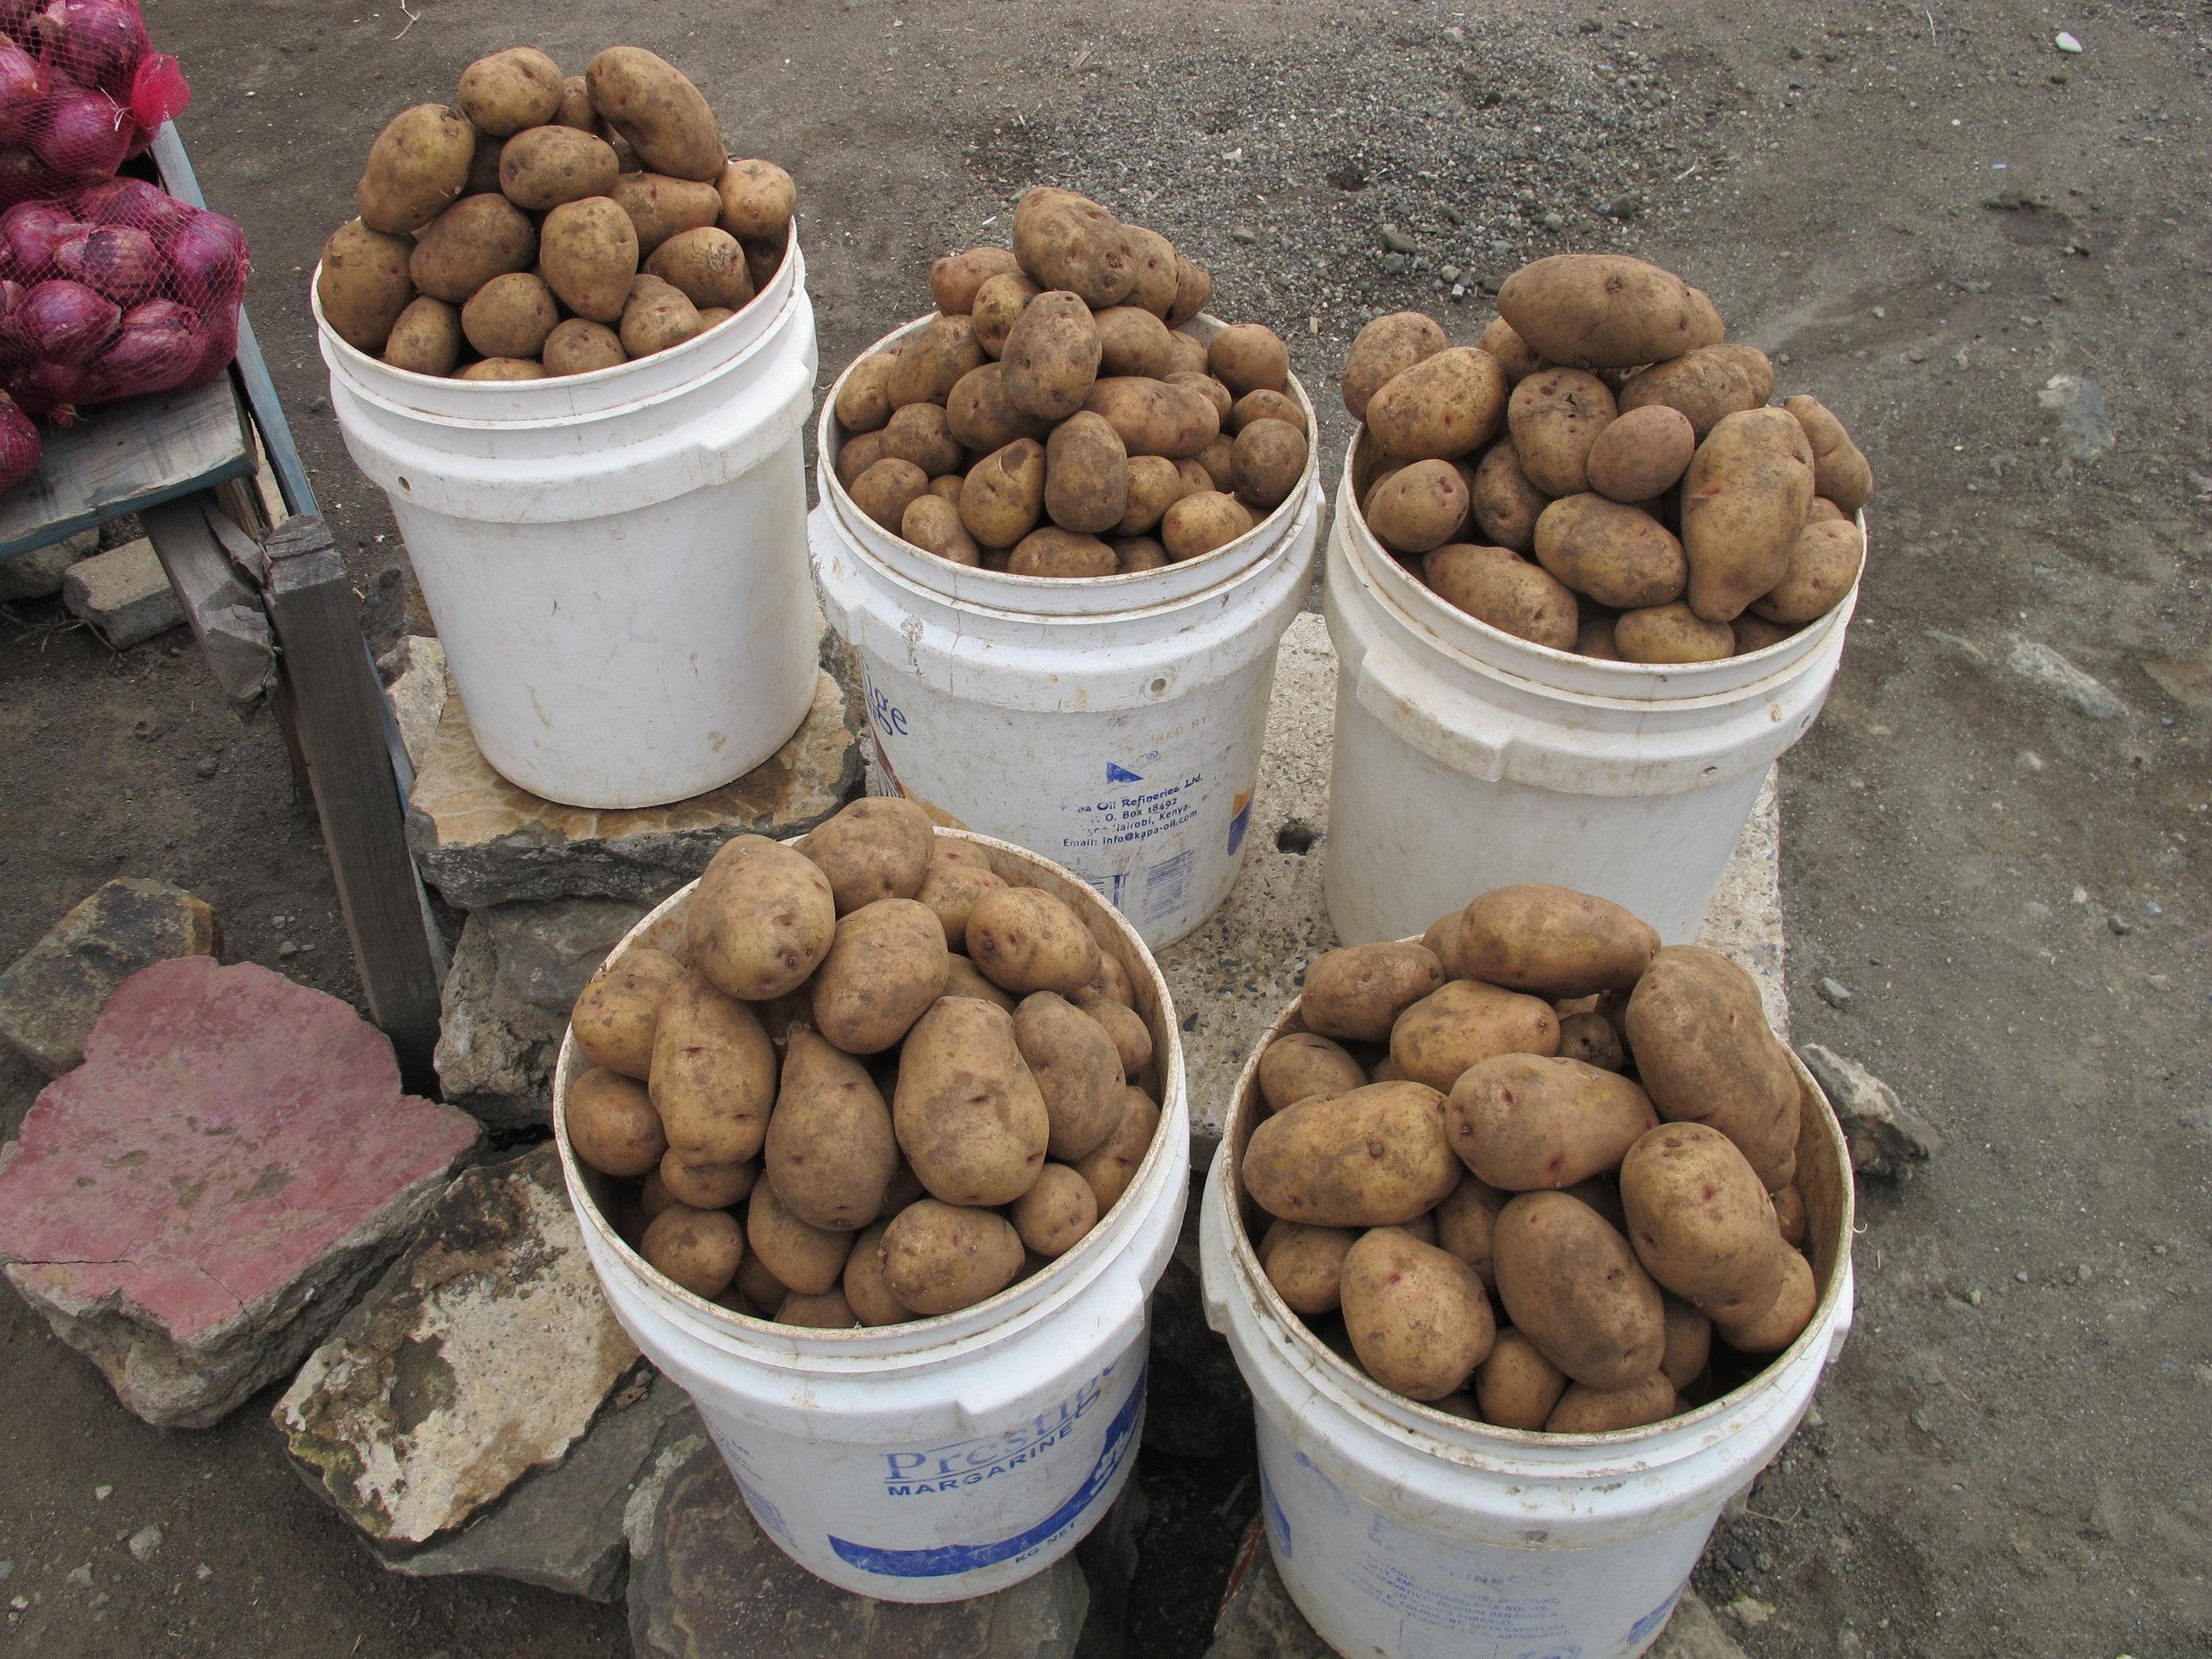 potatobuckets.JPG